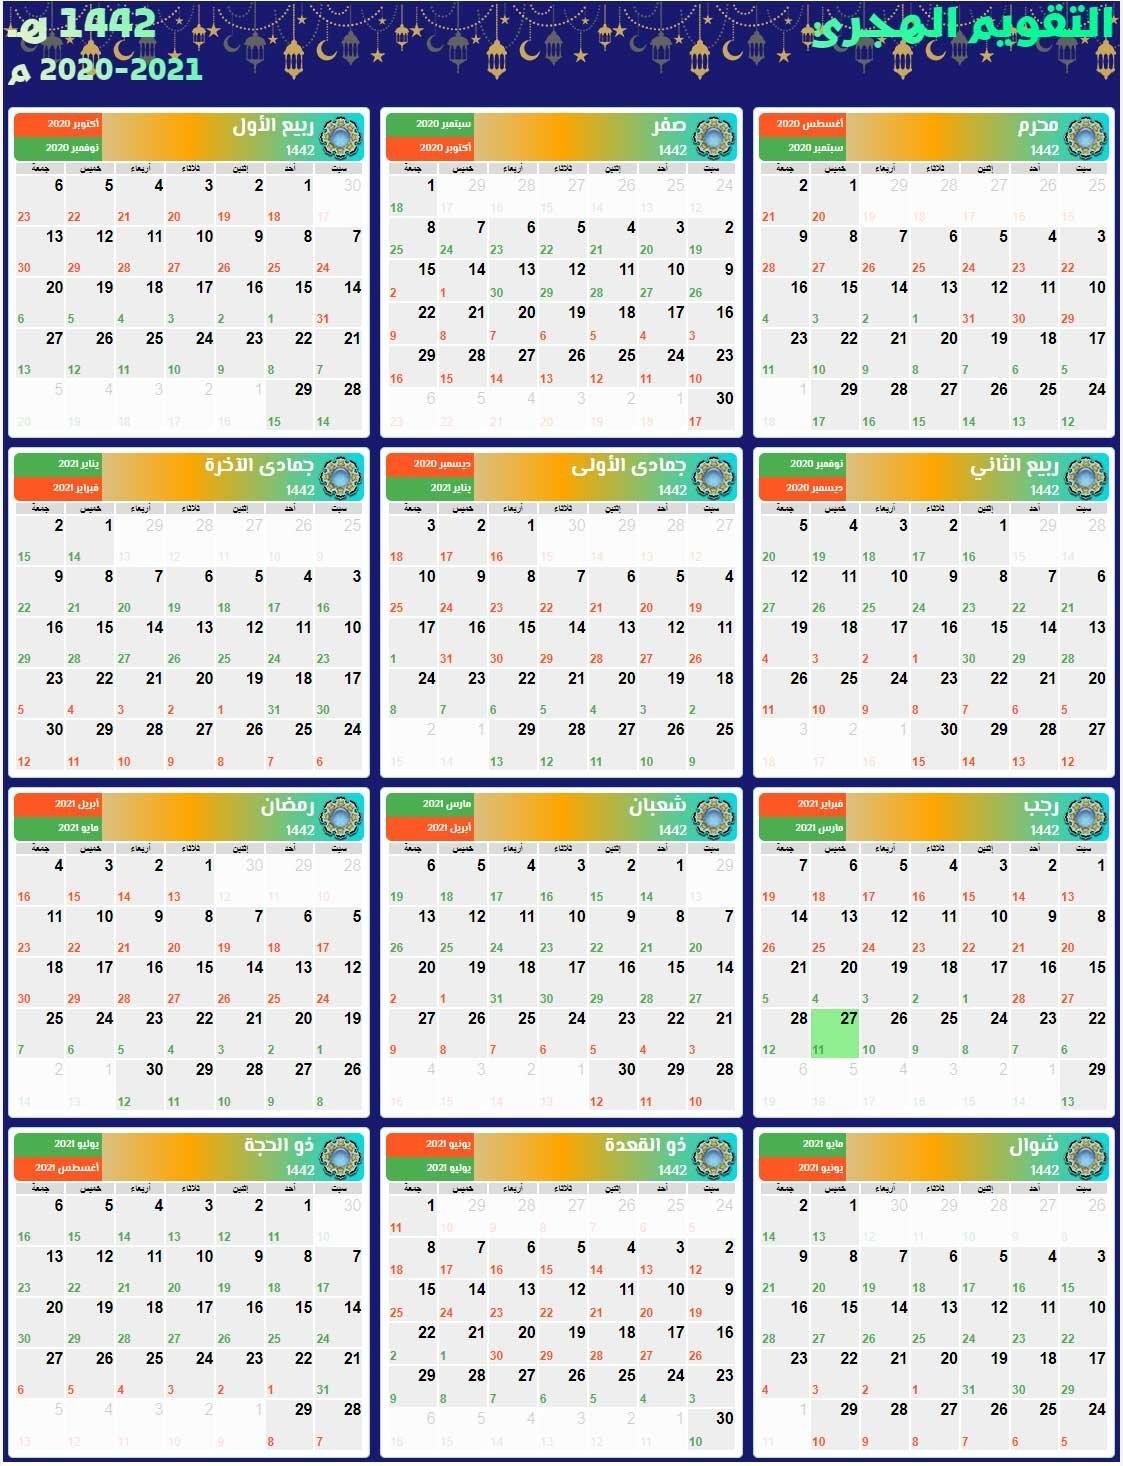 Hijri Gregorian Calendar 1442 In Albania With National Holidays In Albania inside Egypt Holiday Calendar 2021 Photo